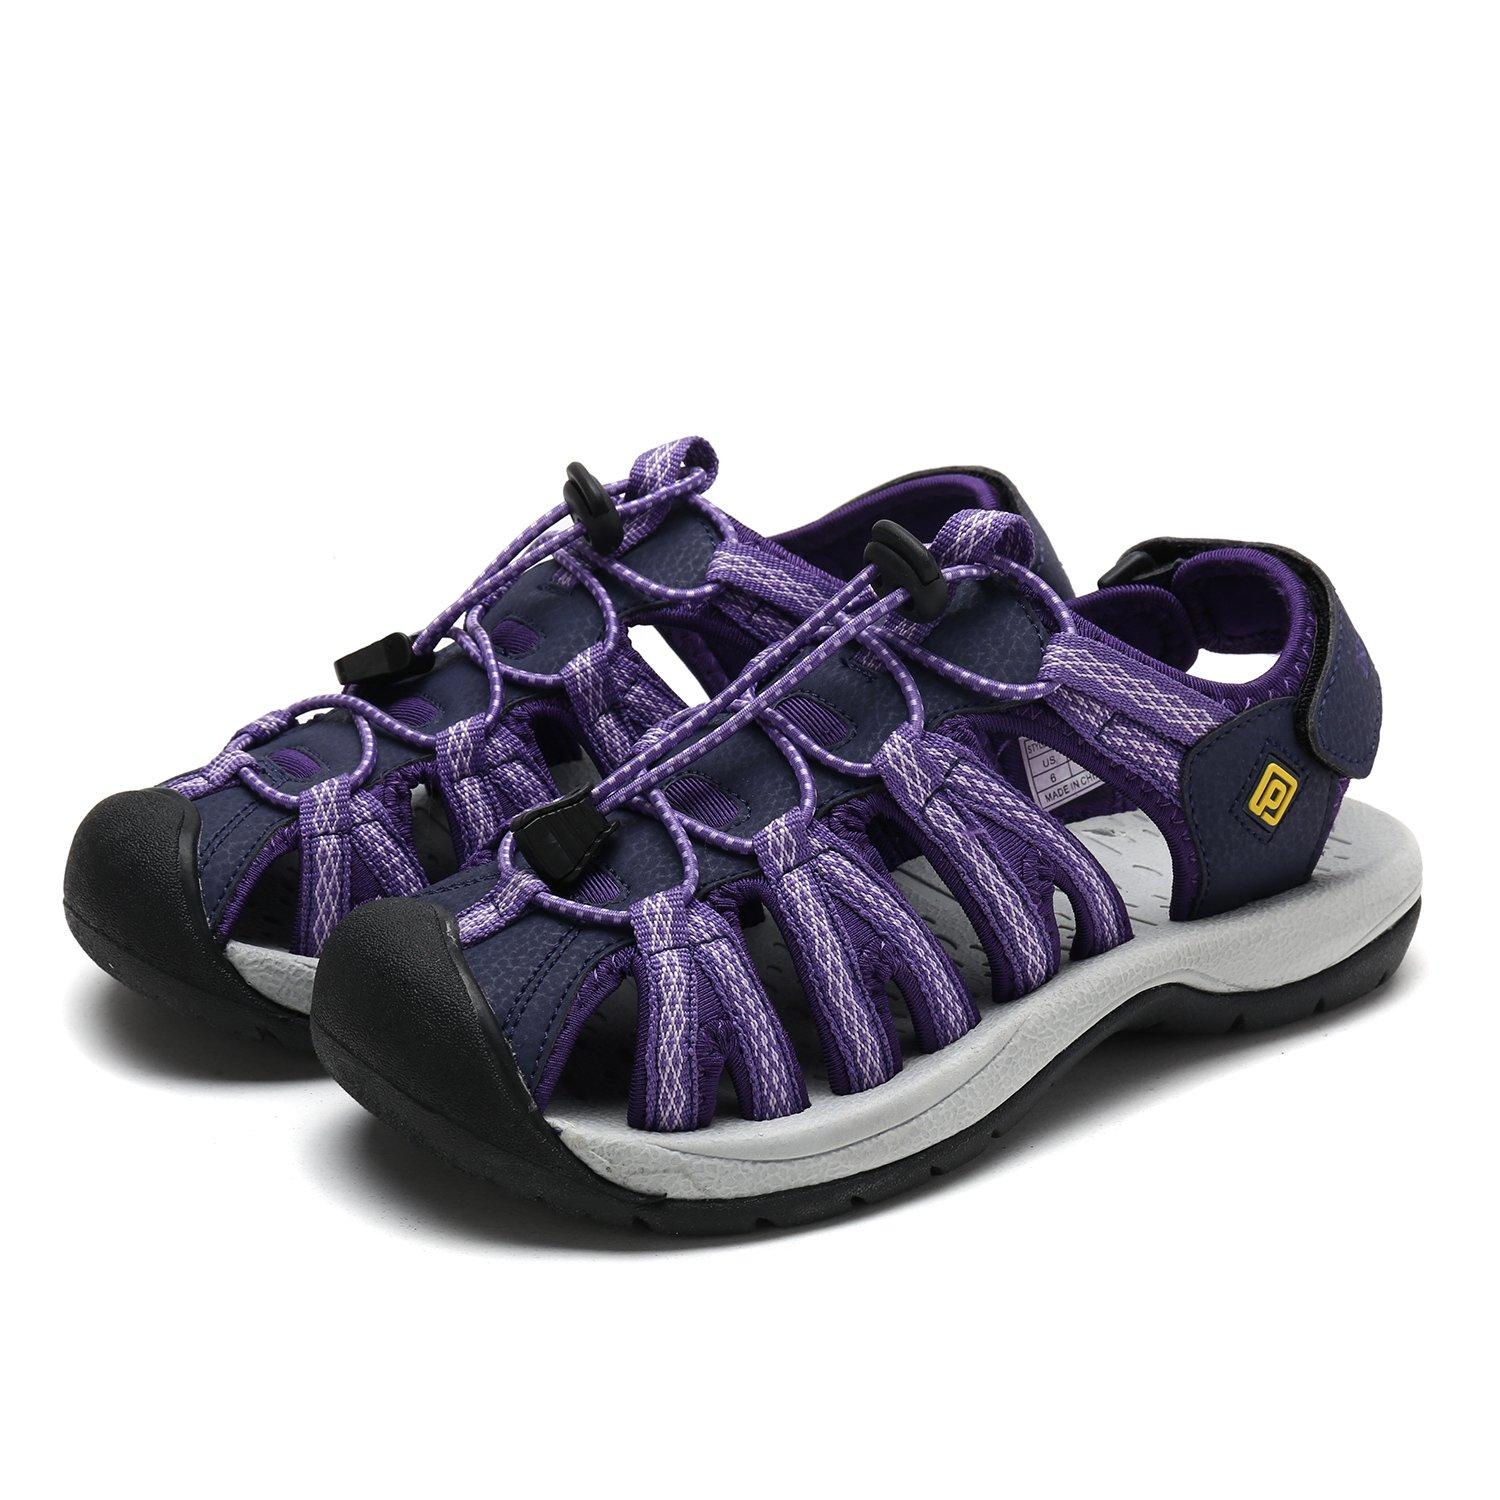 DREAM PAIRS Women's 160912-W Adventurous Summer Outdoor Sandals B077GBSJ95 7 B(M) US|Purple